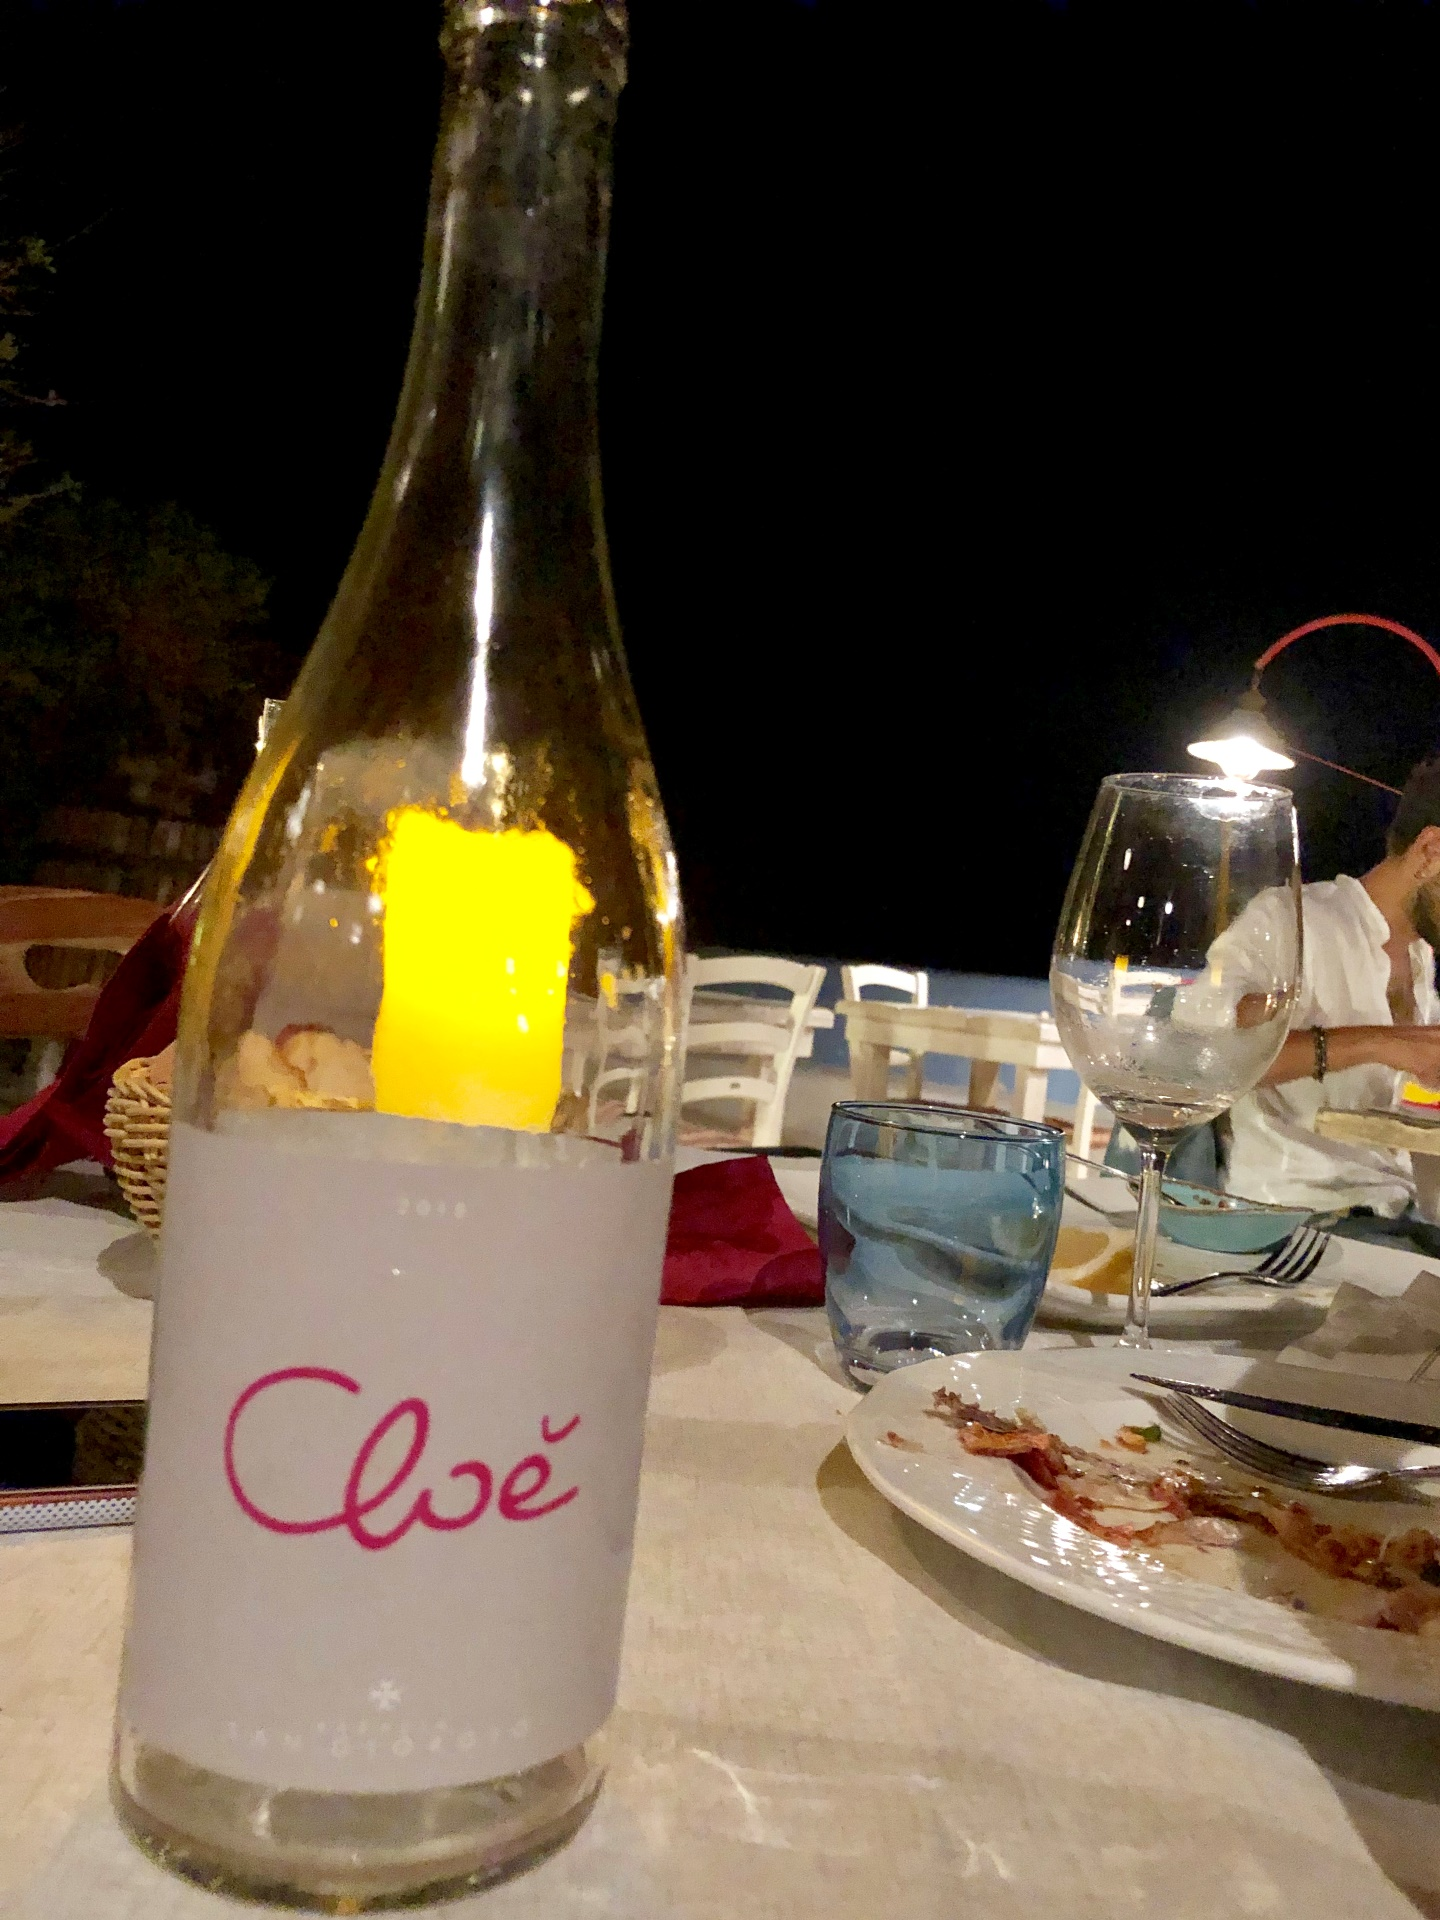 Cloè, Rosato, Pantelleria, Sicilia